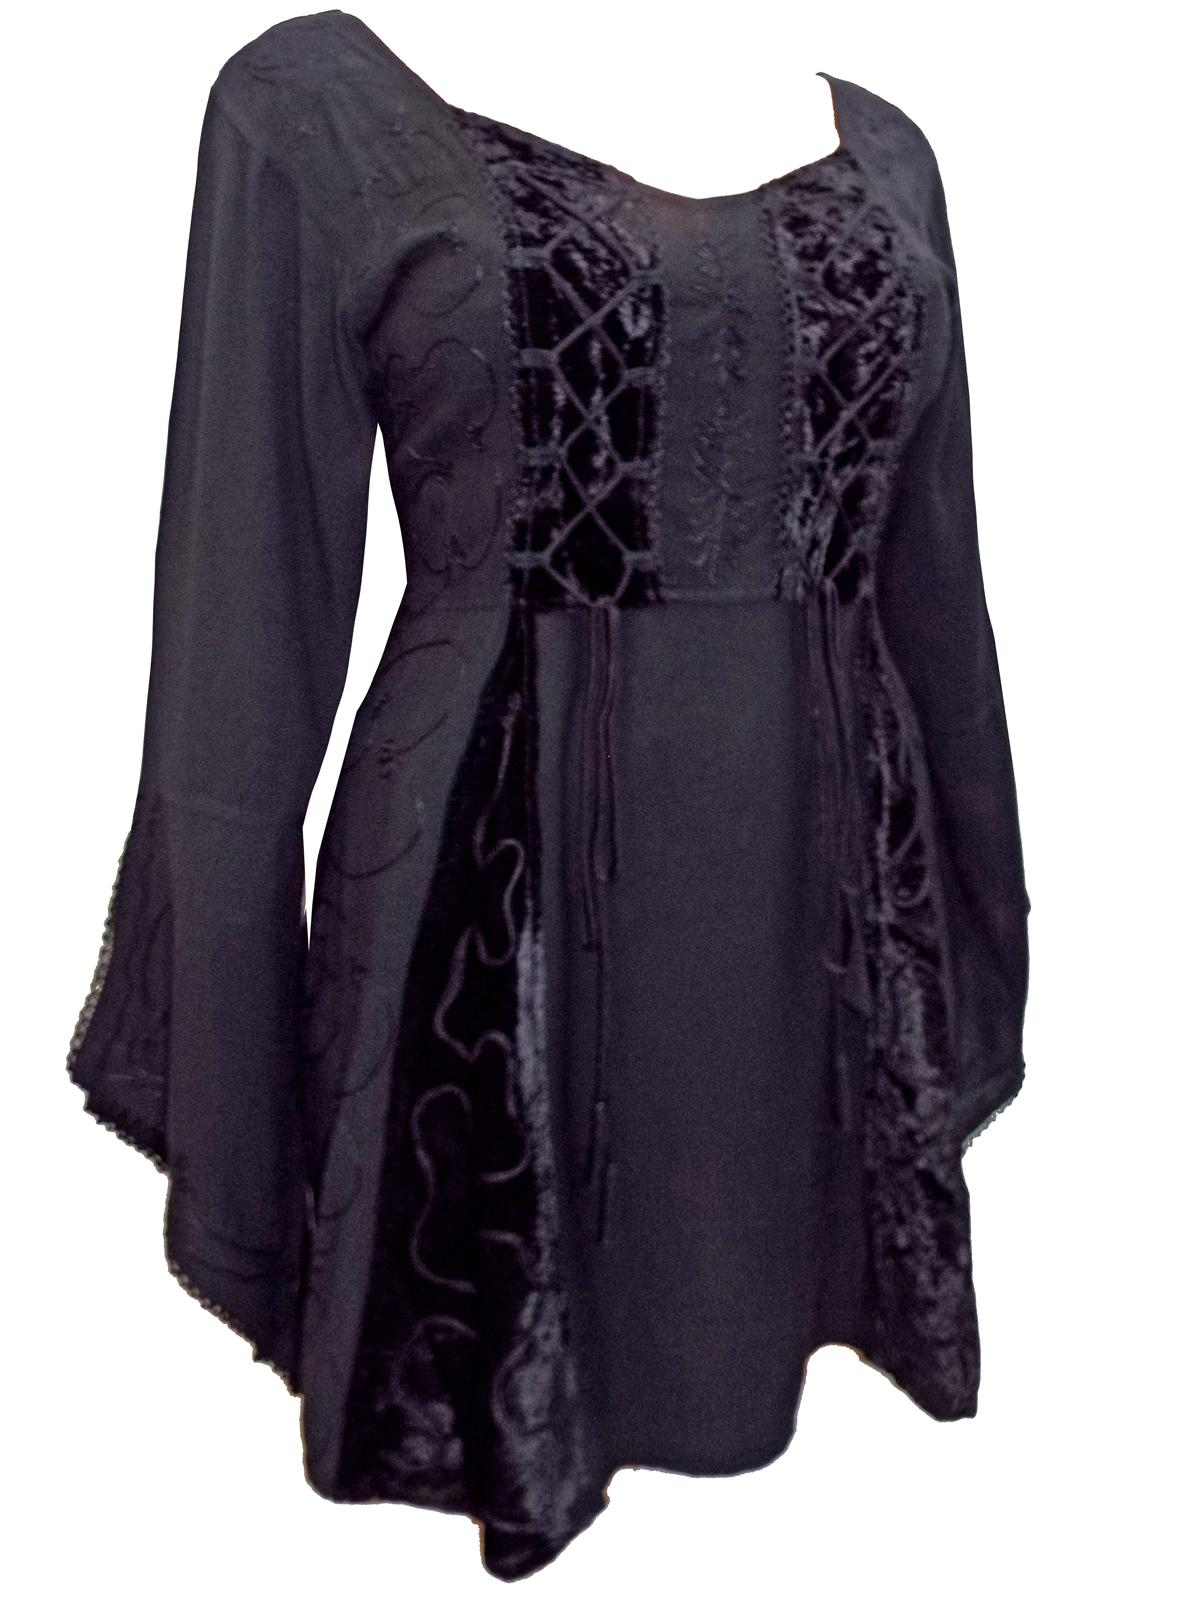 d452189d6a4 eaonplus BLACK Embroidered Renaissance Gothic Corset Tunic Top ...